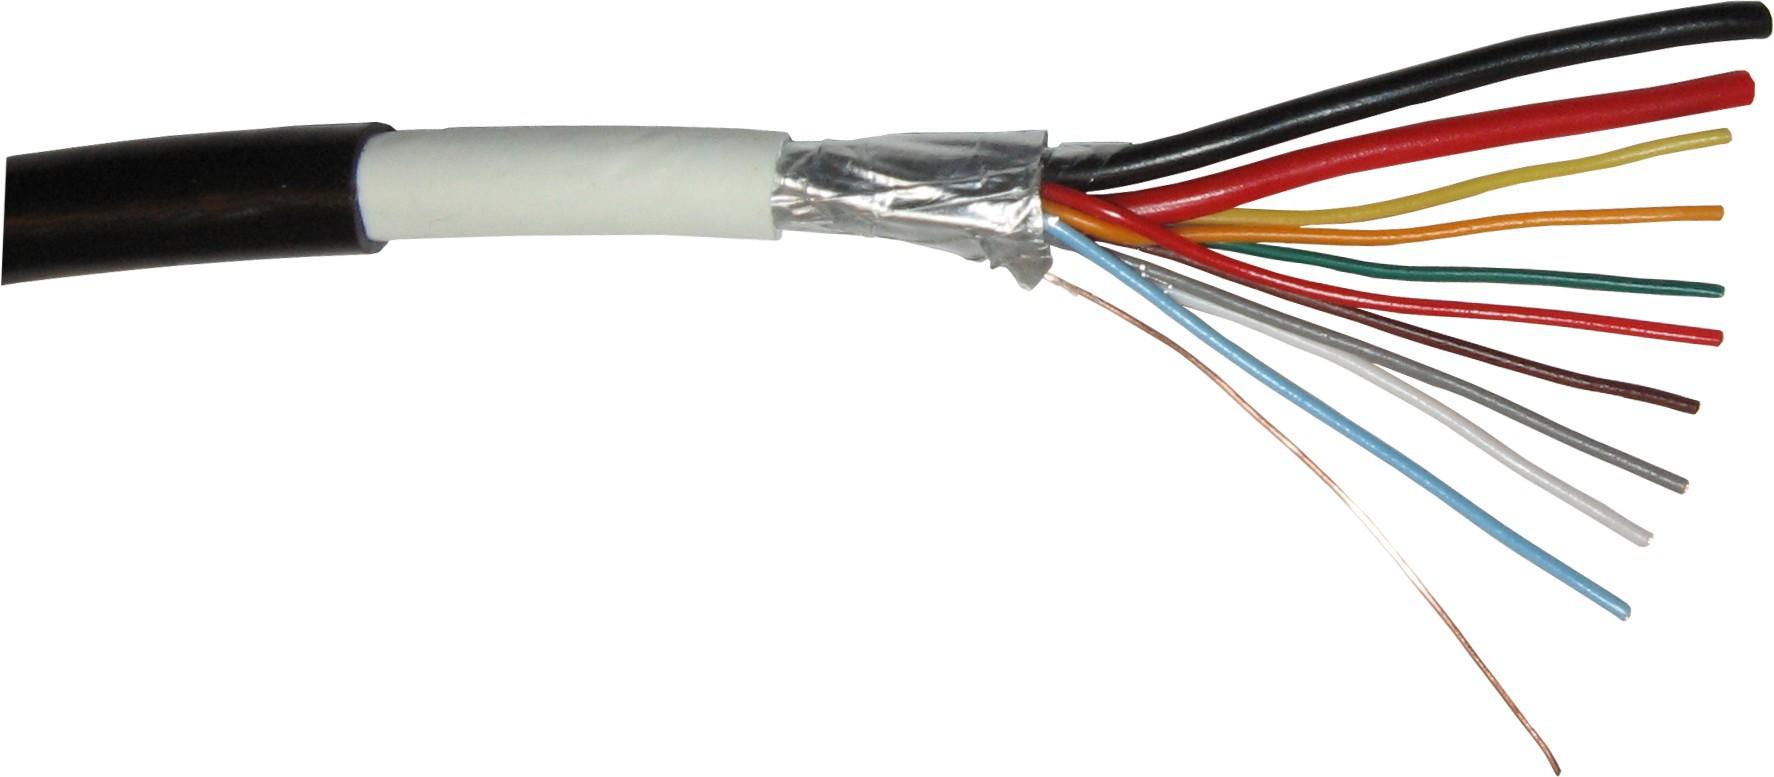 JA-151TH - Bezdrátový detektor teploty